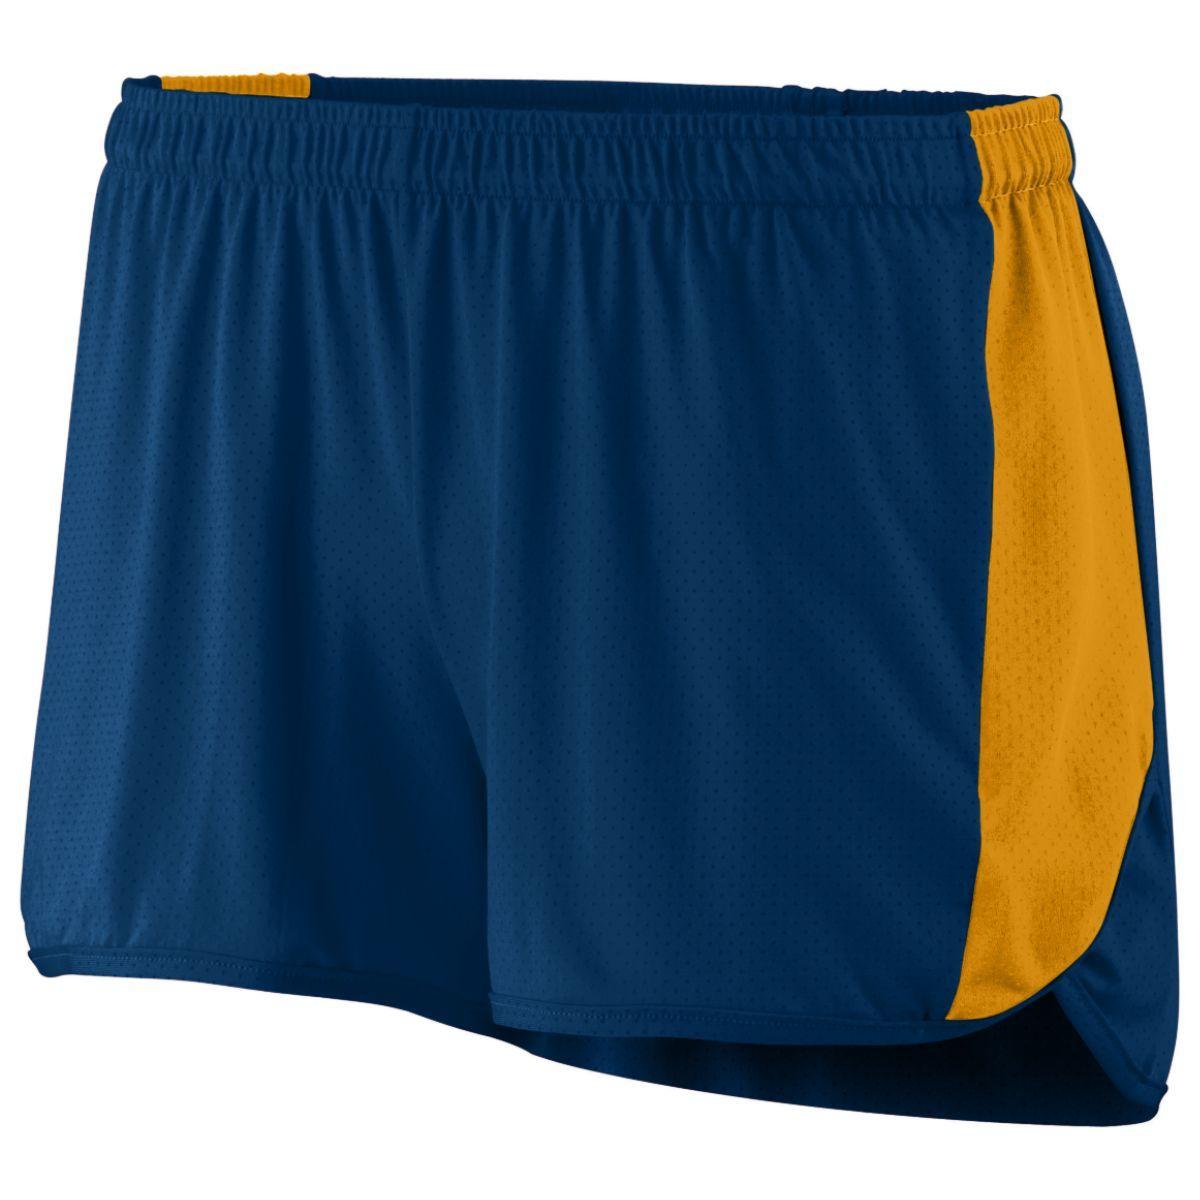 Ladies Sprint Shorts - NAVY/GOLD